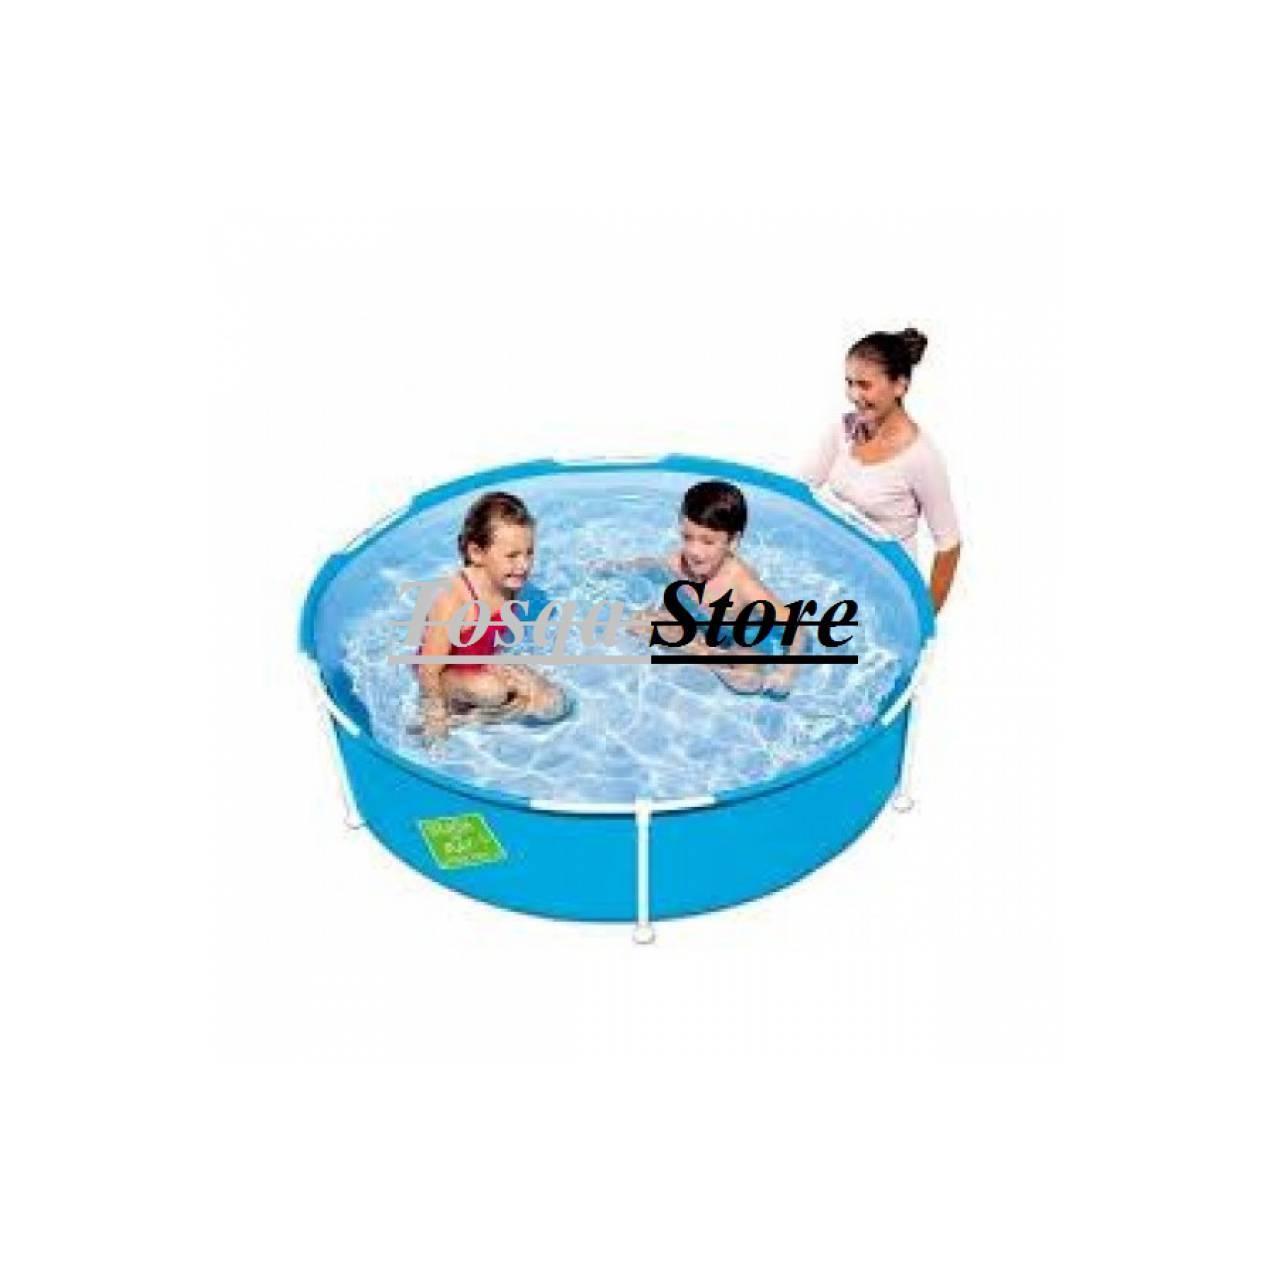 Kolam Renang Bestway Frame Pool Bulat 152cm 56283 / Kolam Bestway